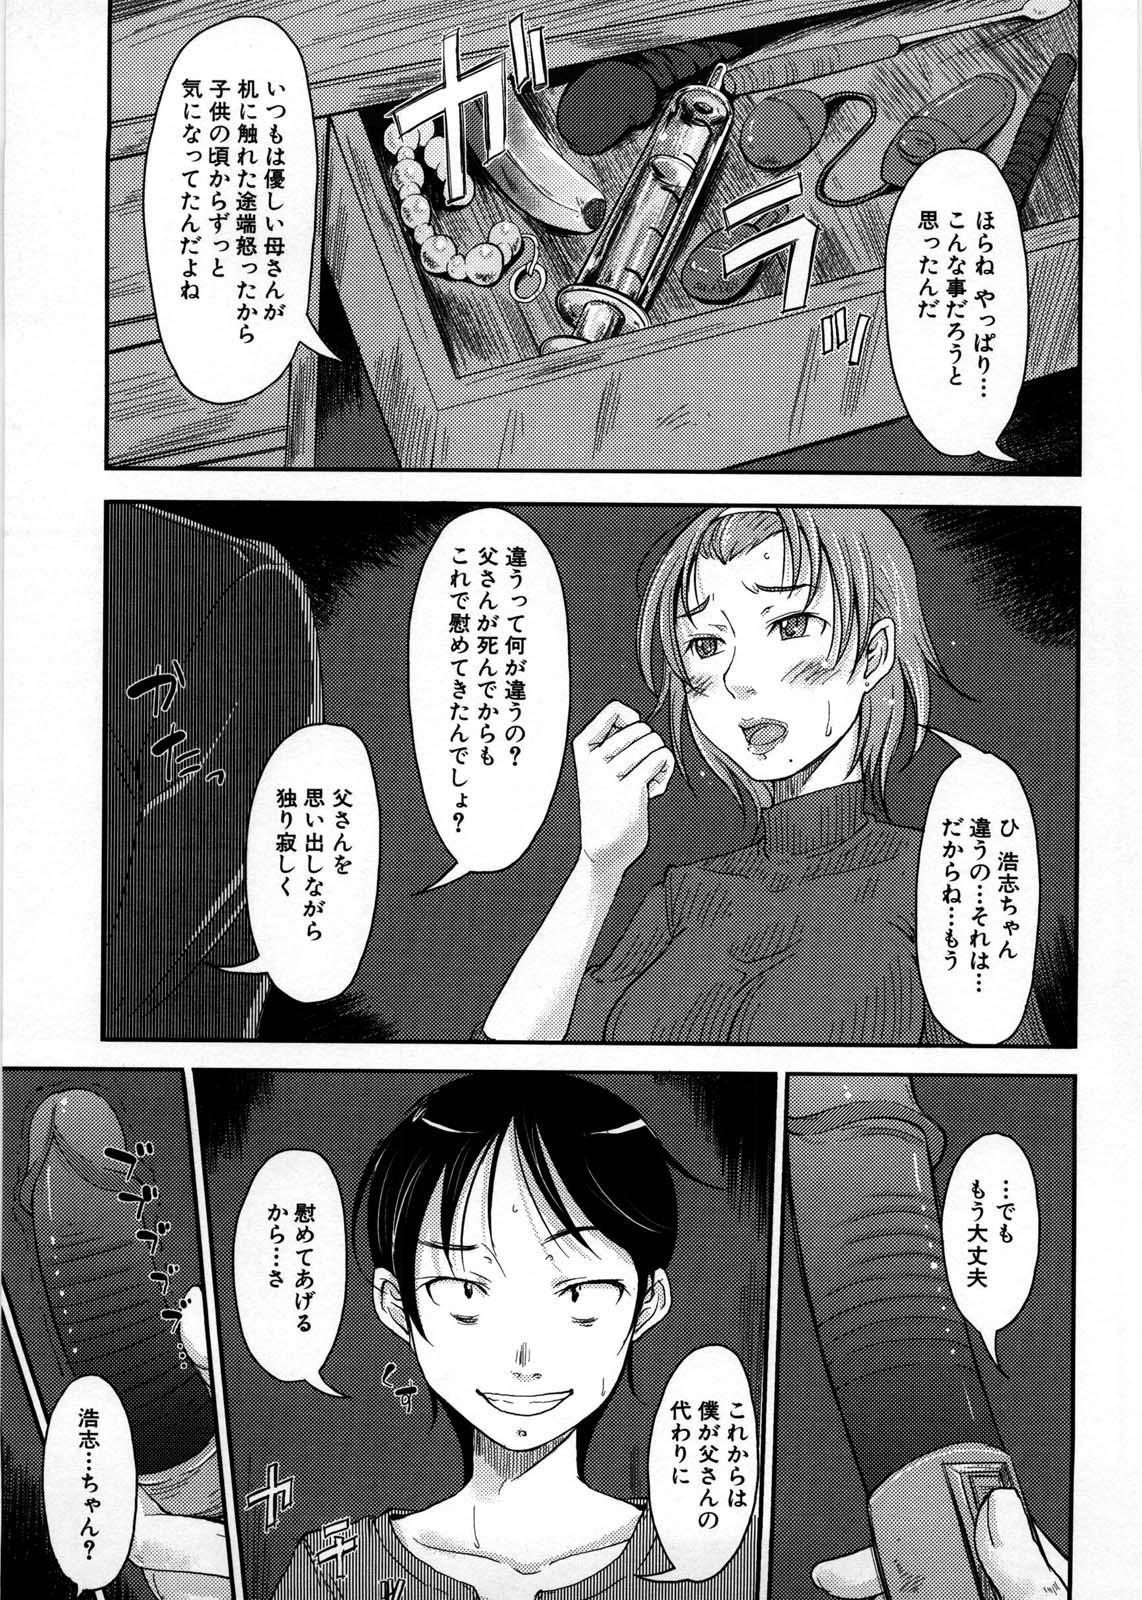 Imouto Ijou Hahaoya Miman 135